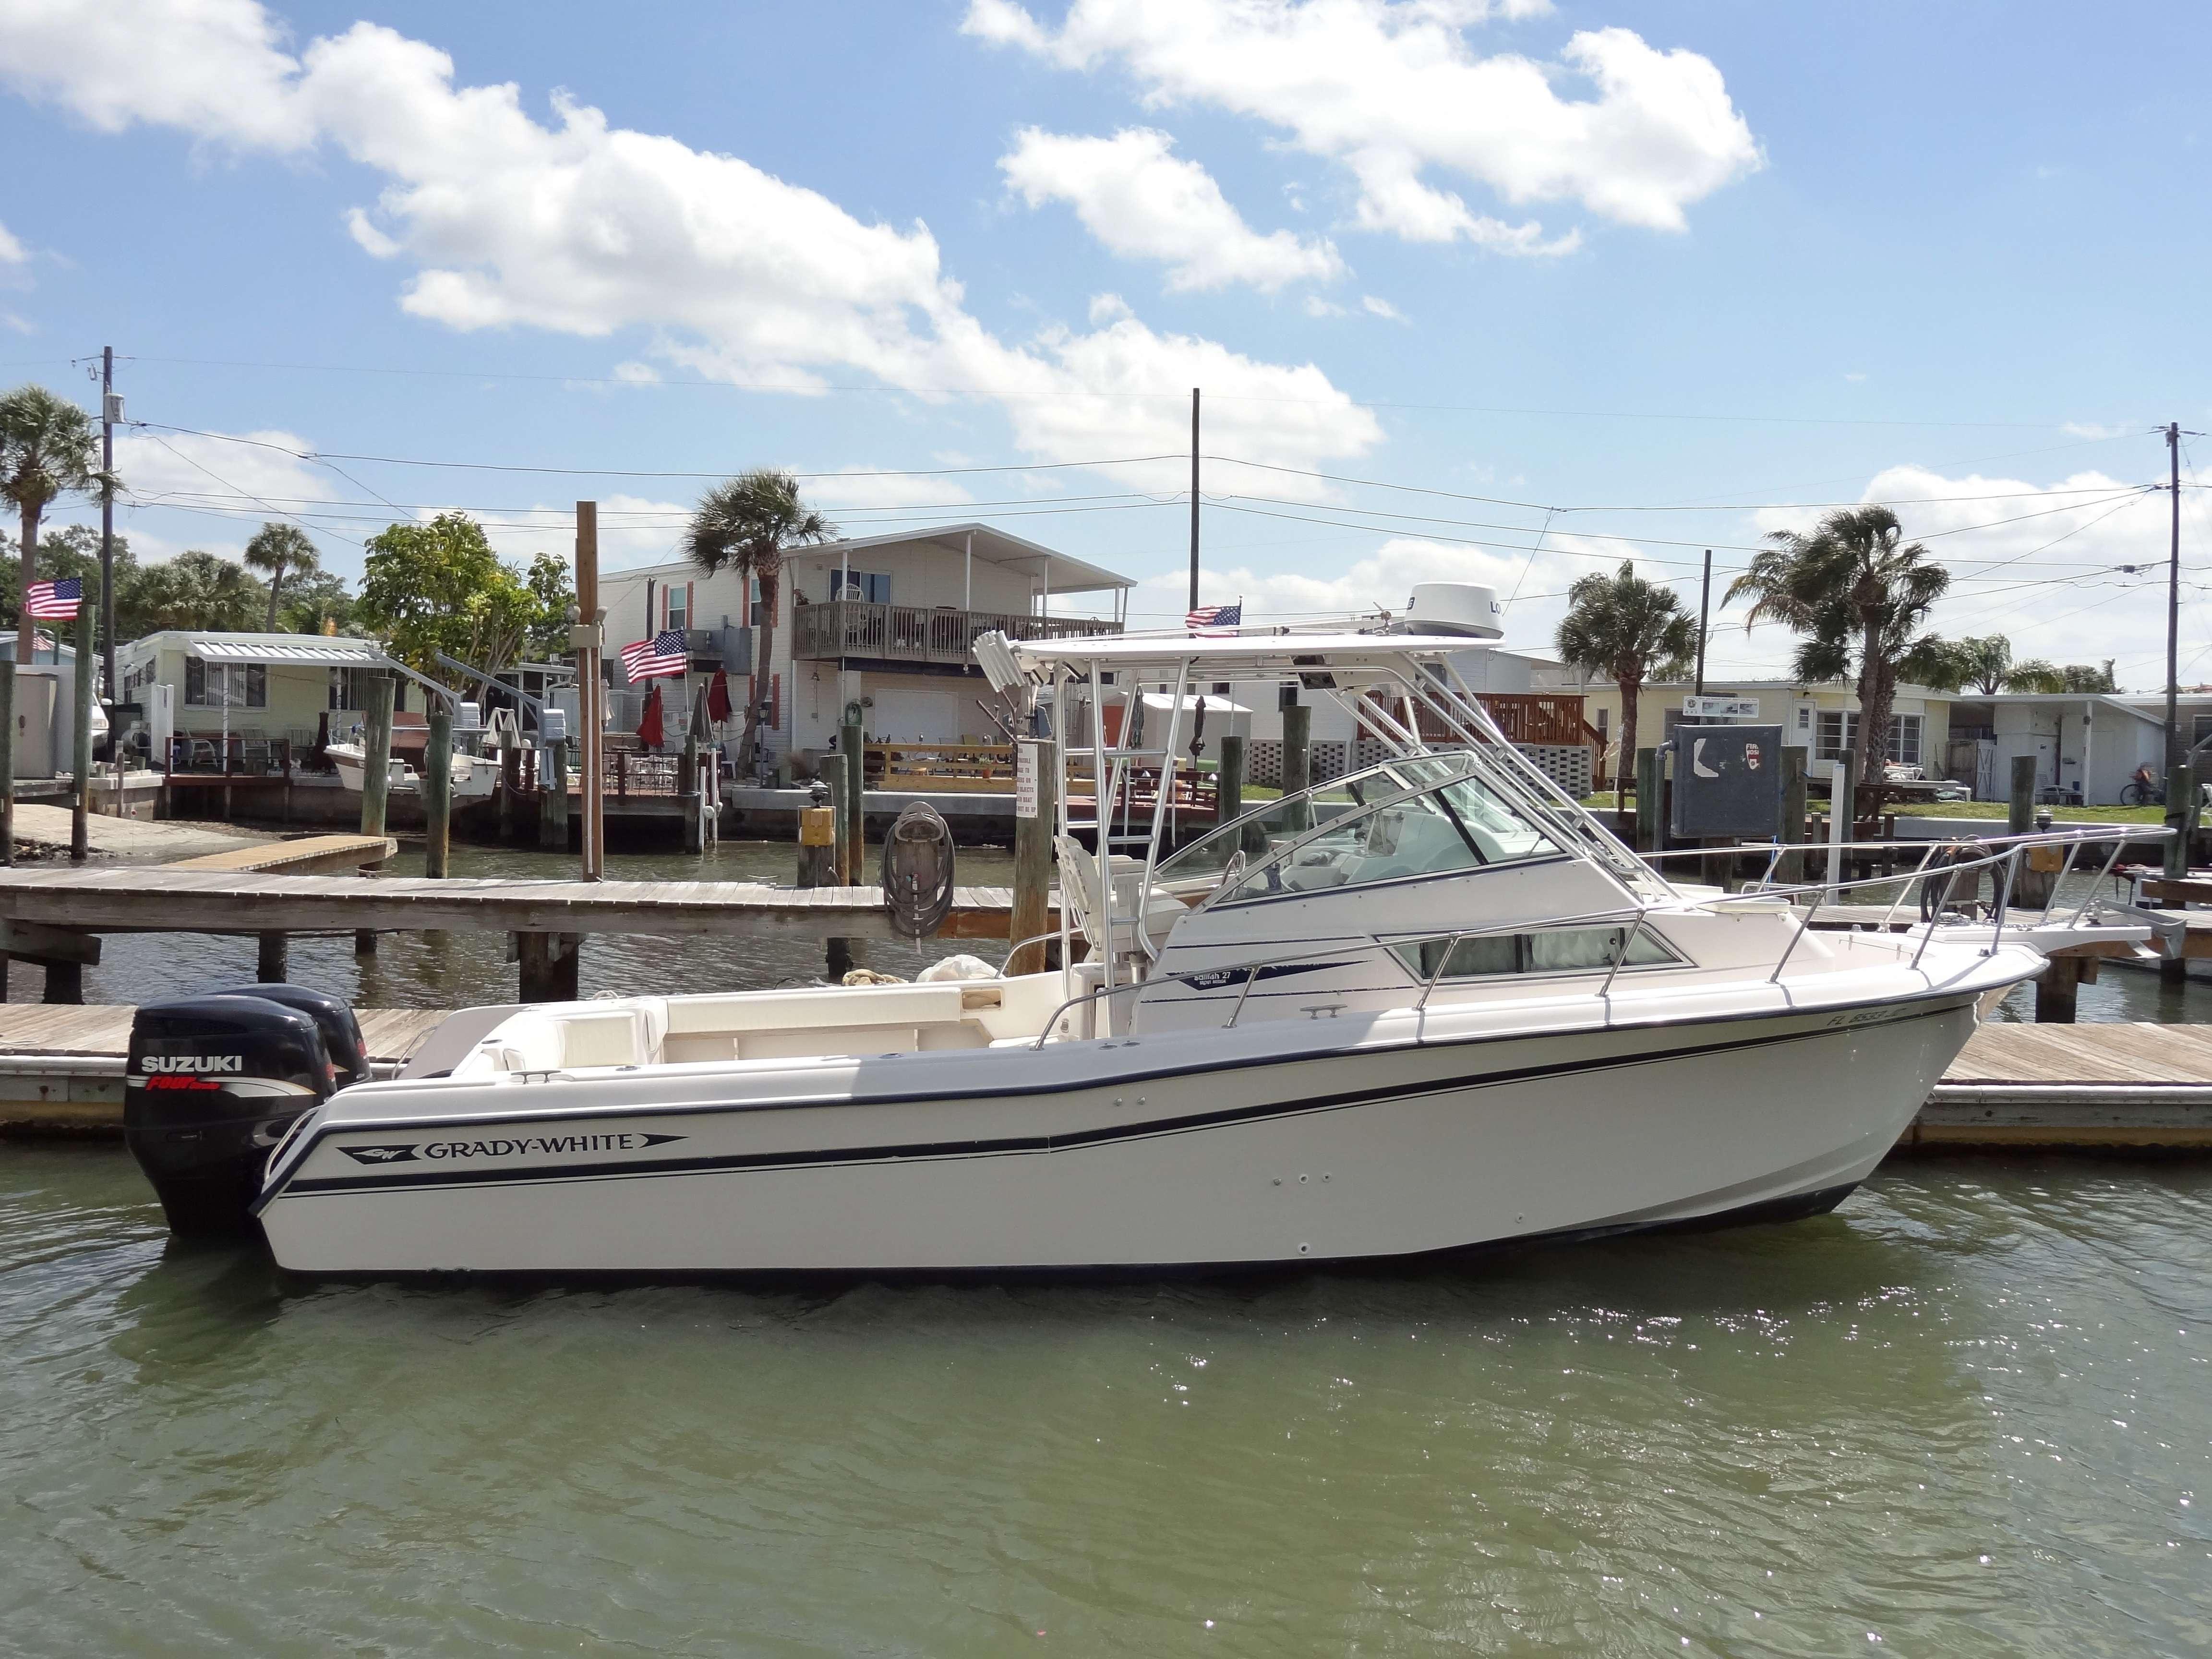 Wholesaleingfla grady white 272 sailfish walk offshore for Grady white fishing boats